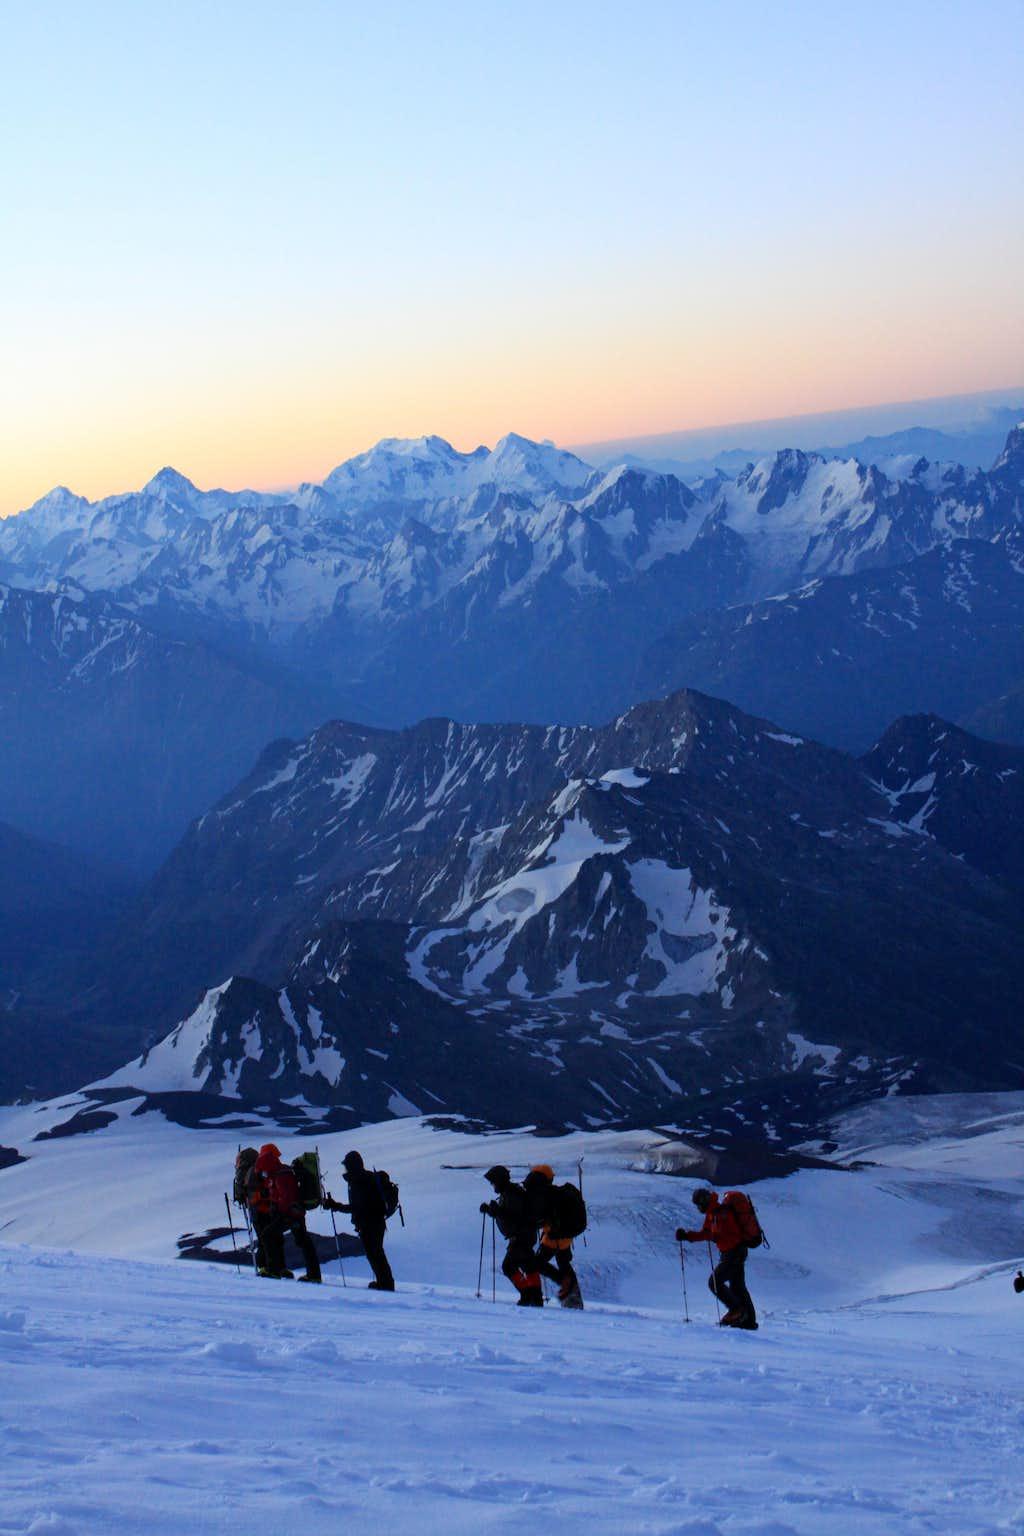 gentle slope : Photos, Diagrams & Topos : SummitPost